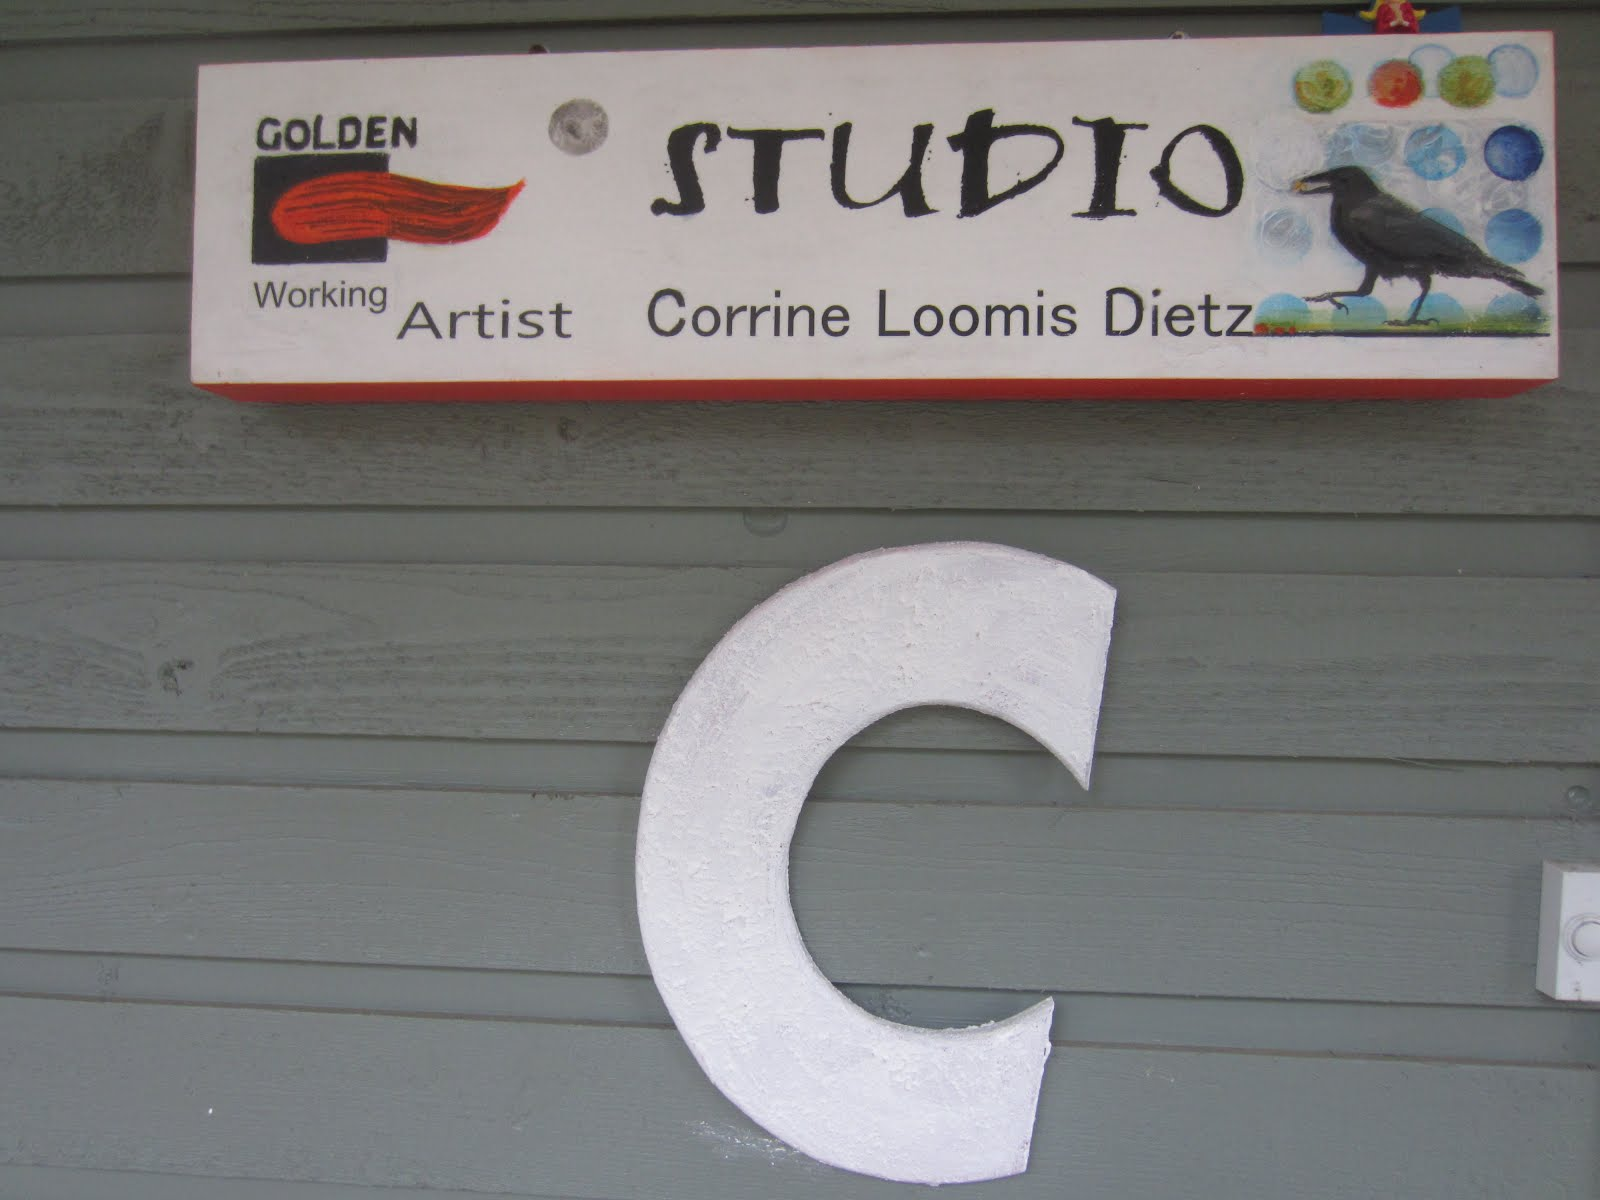 Studio c dating